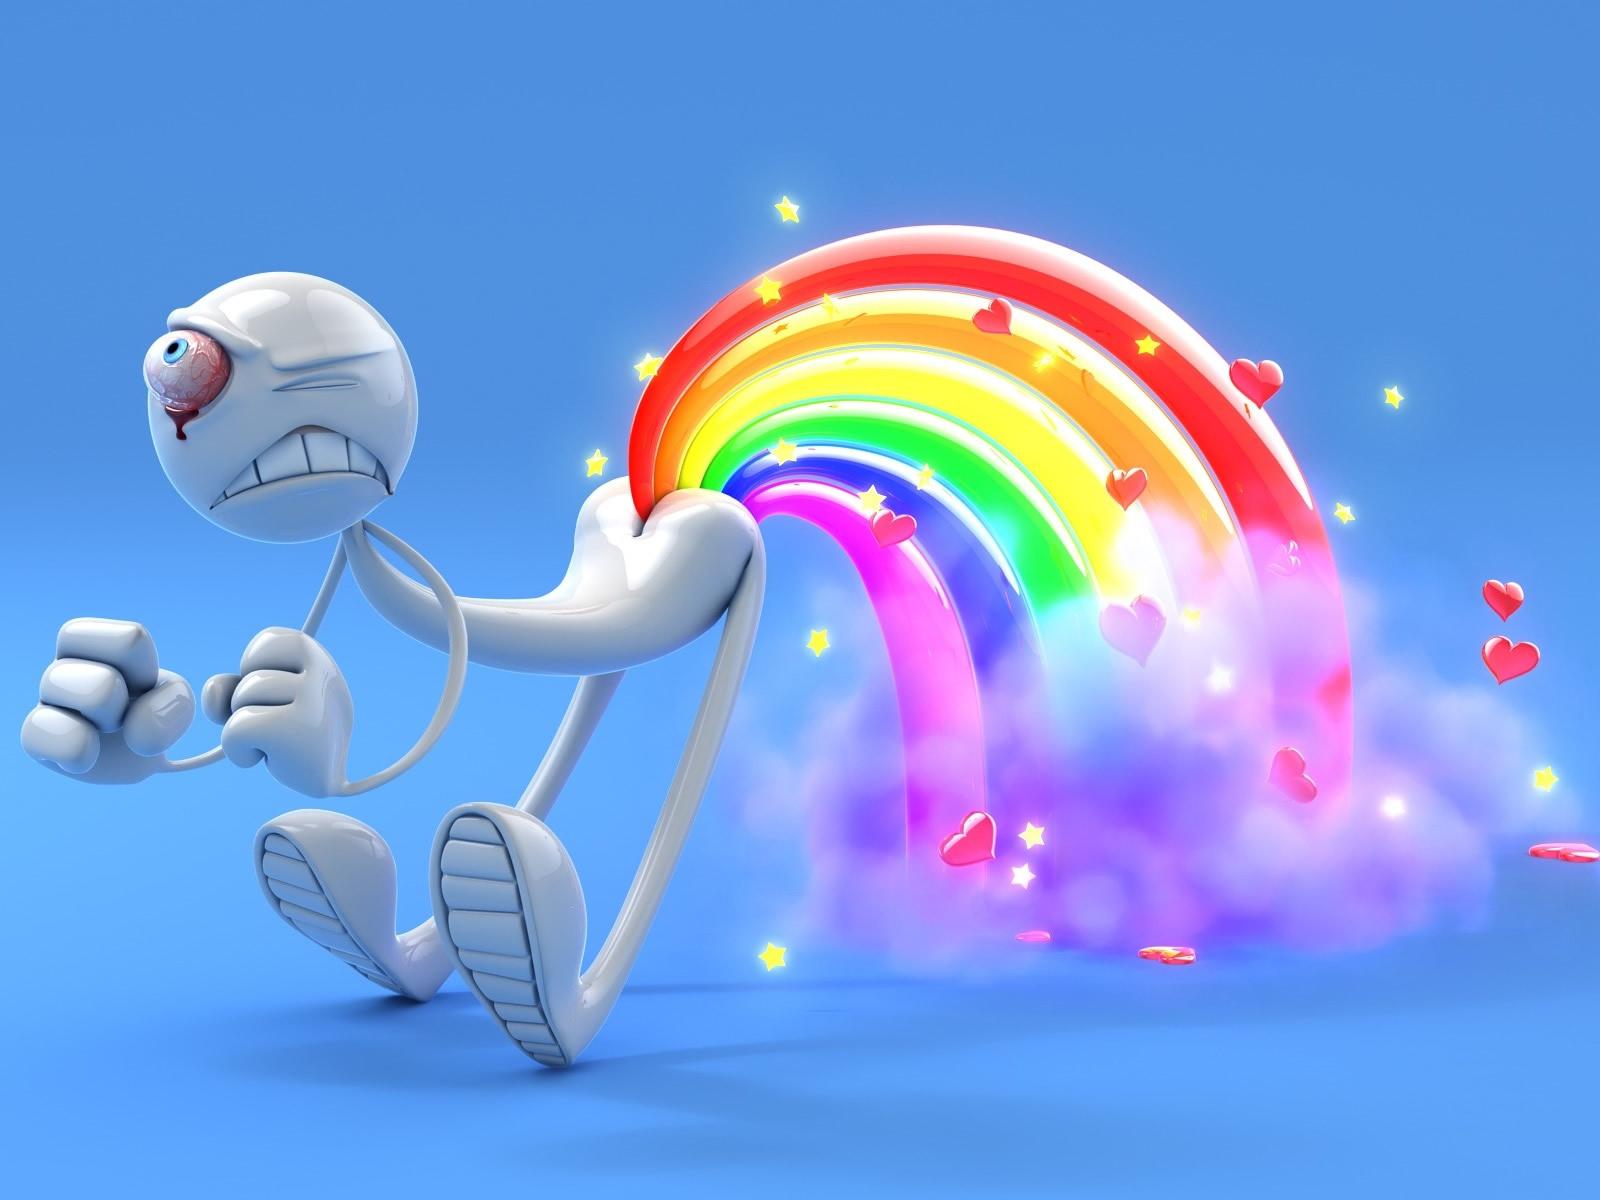 3d Hd Funny Rainbow Wallpaper Hd Wallpapers